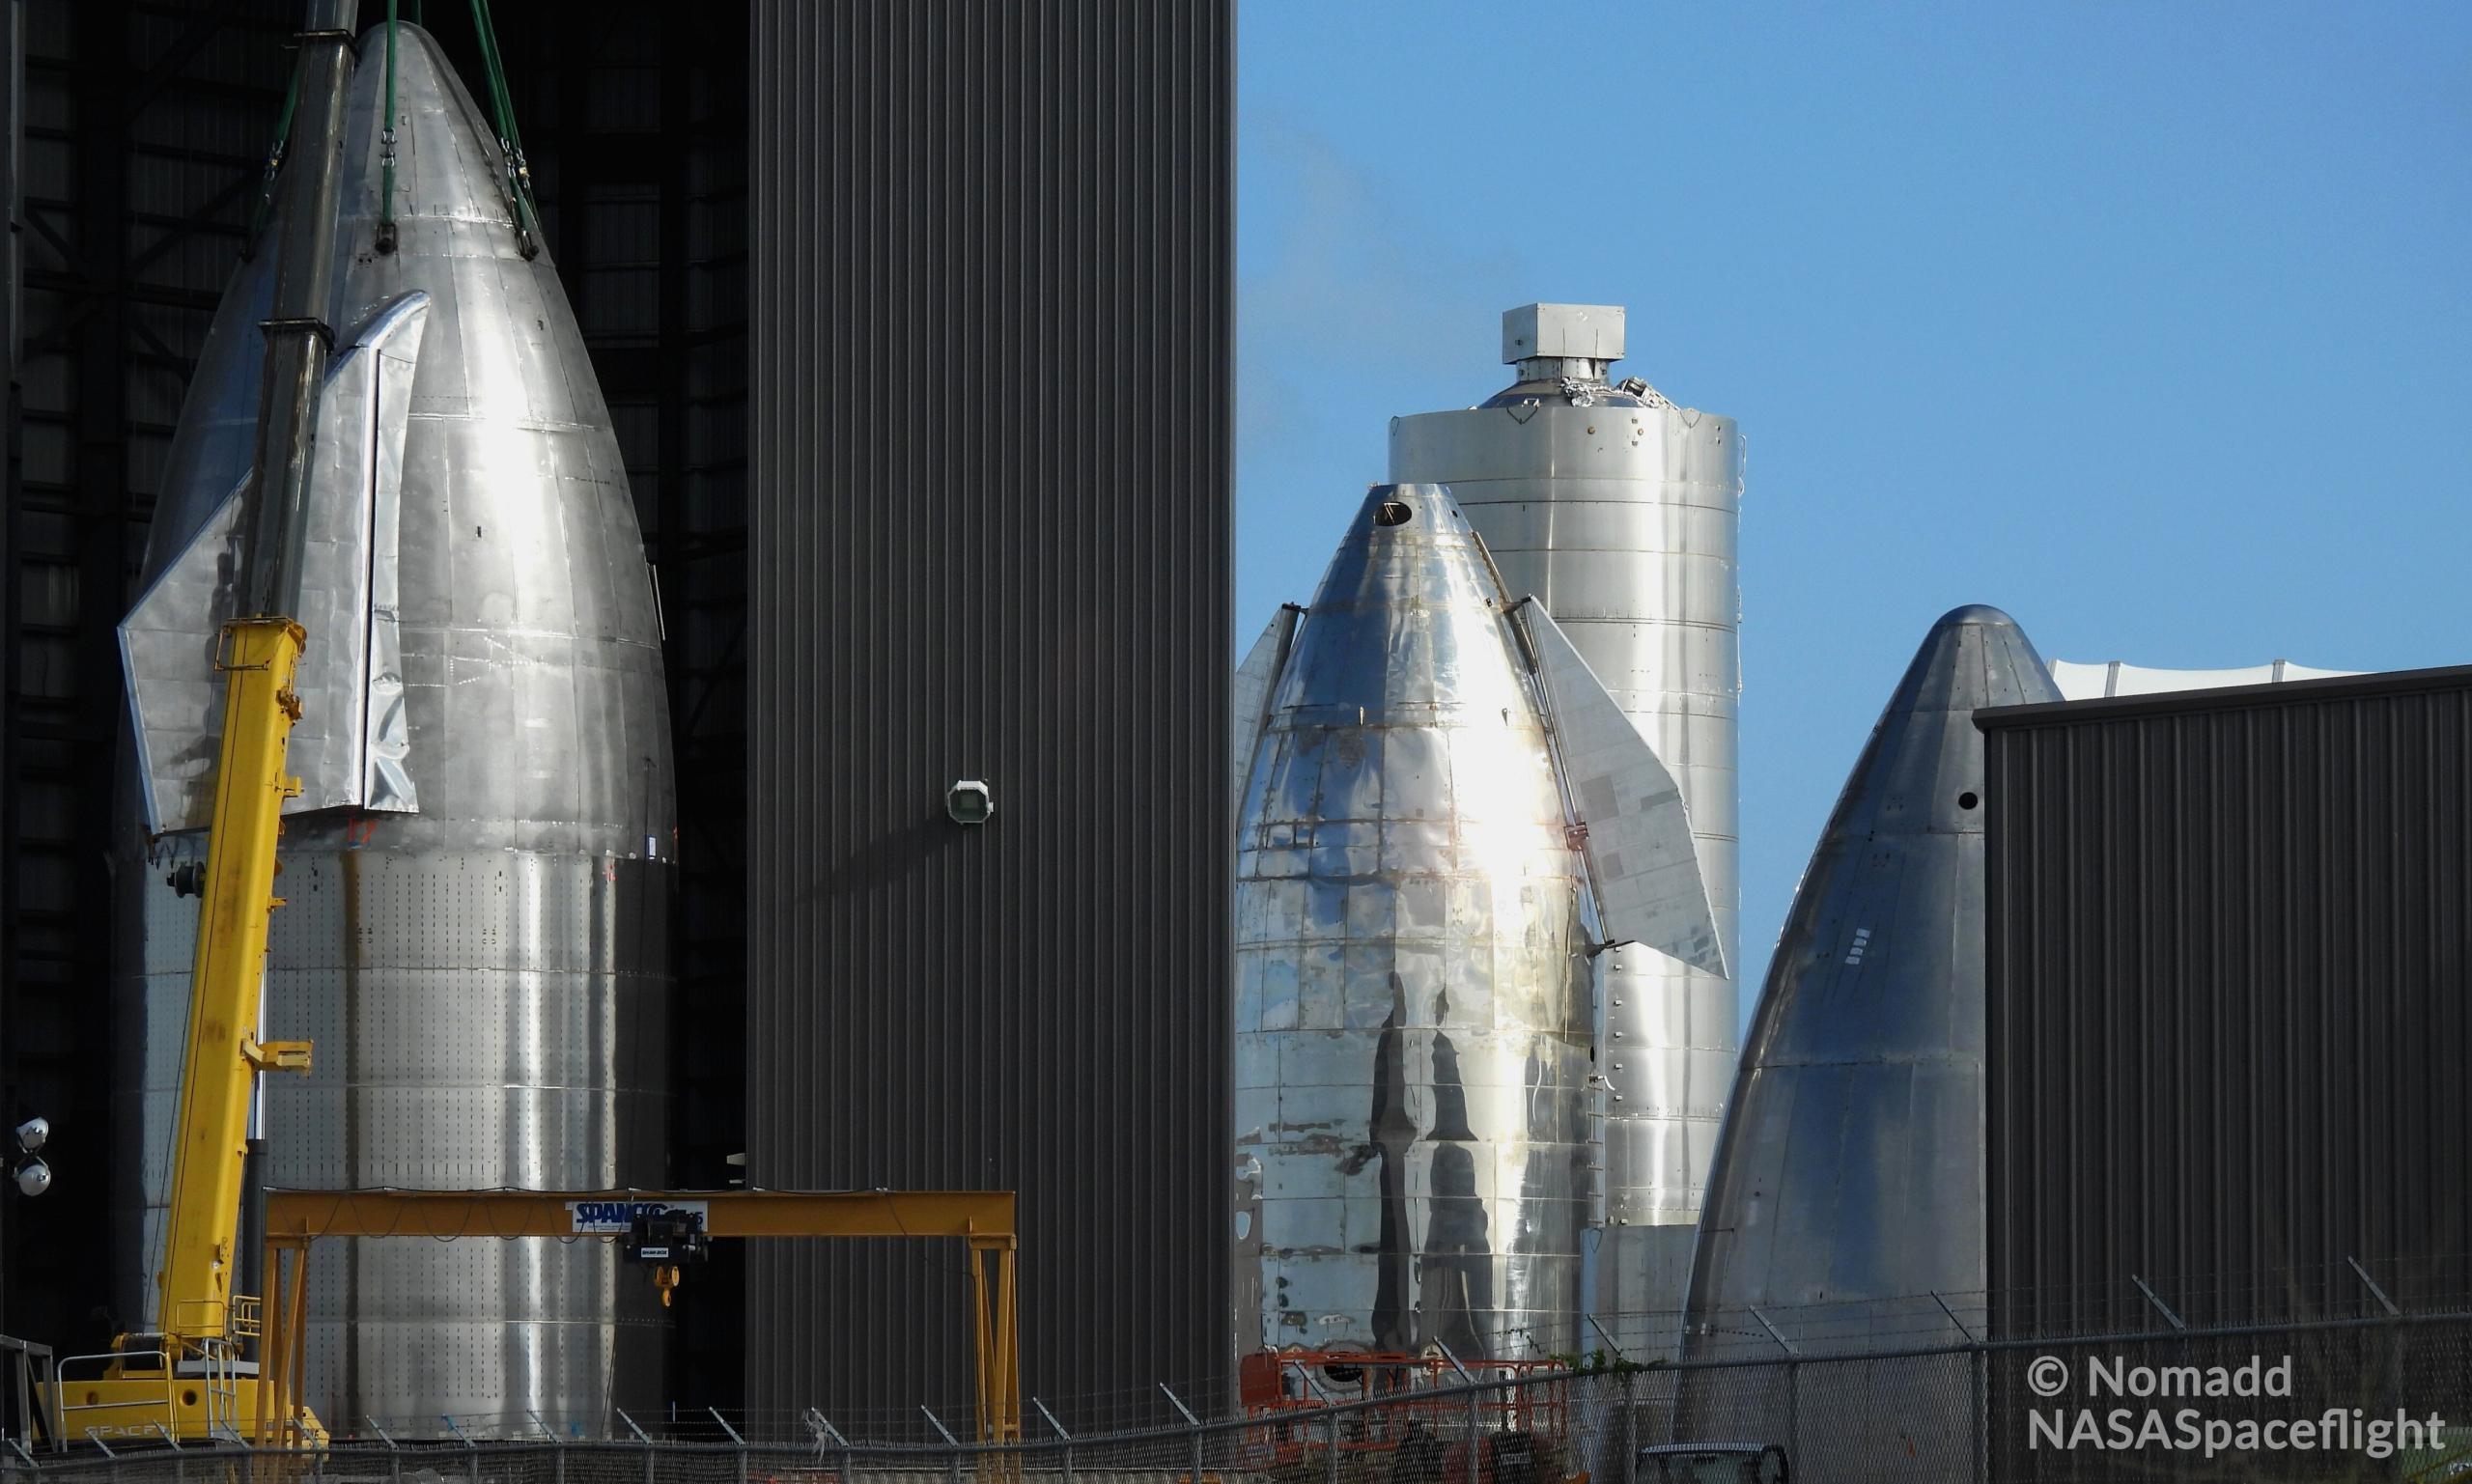 Starship Boca Chica 101920 (NASASpaceflight – Nomadd) SN8 nose stack 2 crop (c)